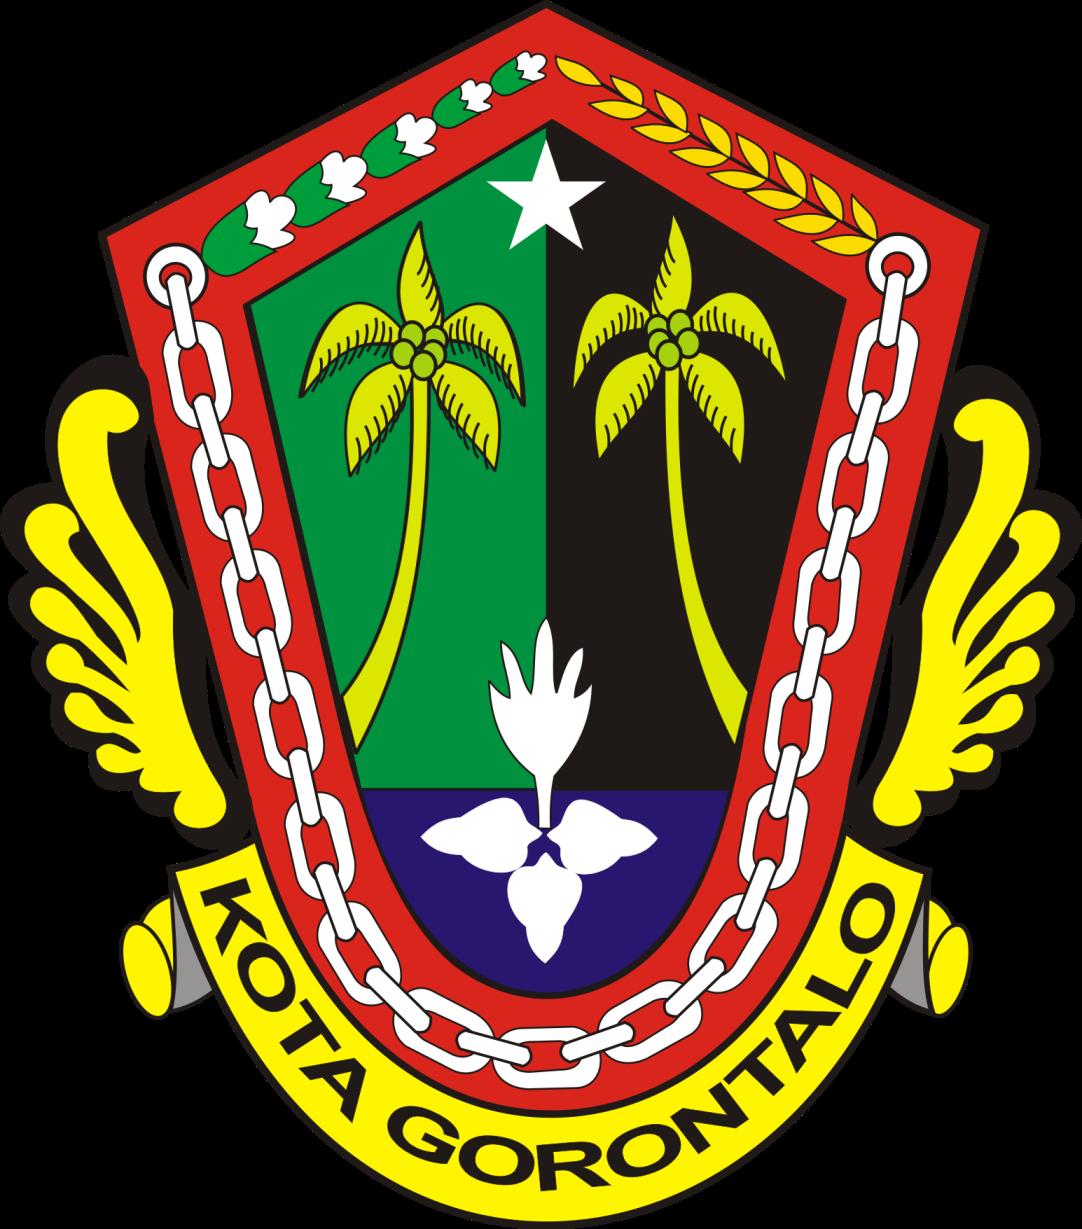 Berkas Logo Kota Gorontalo Png Wikipedia Bahasa Indonesia Ensiklopedia Bebas